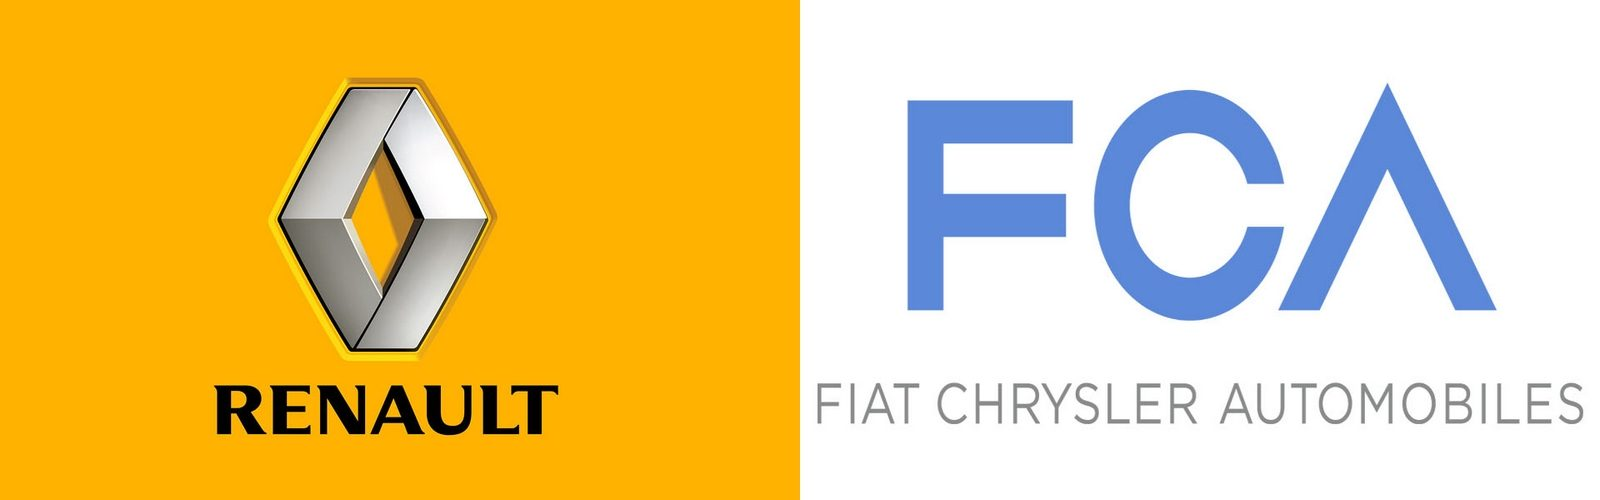 Renault-FCA Rapprochement